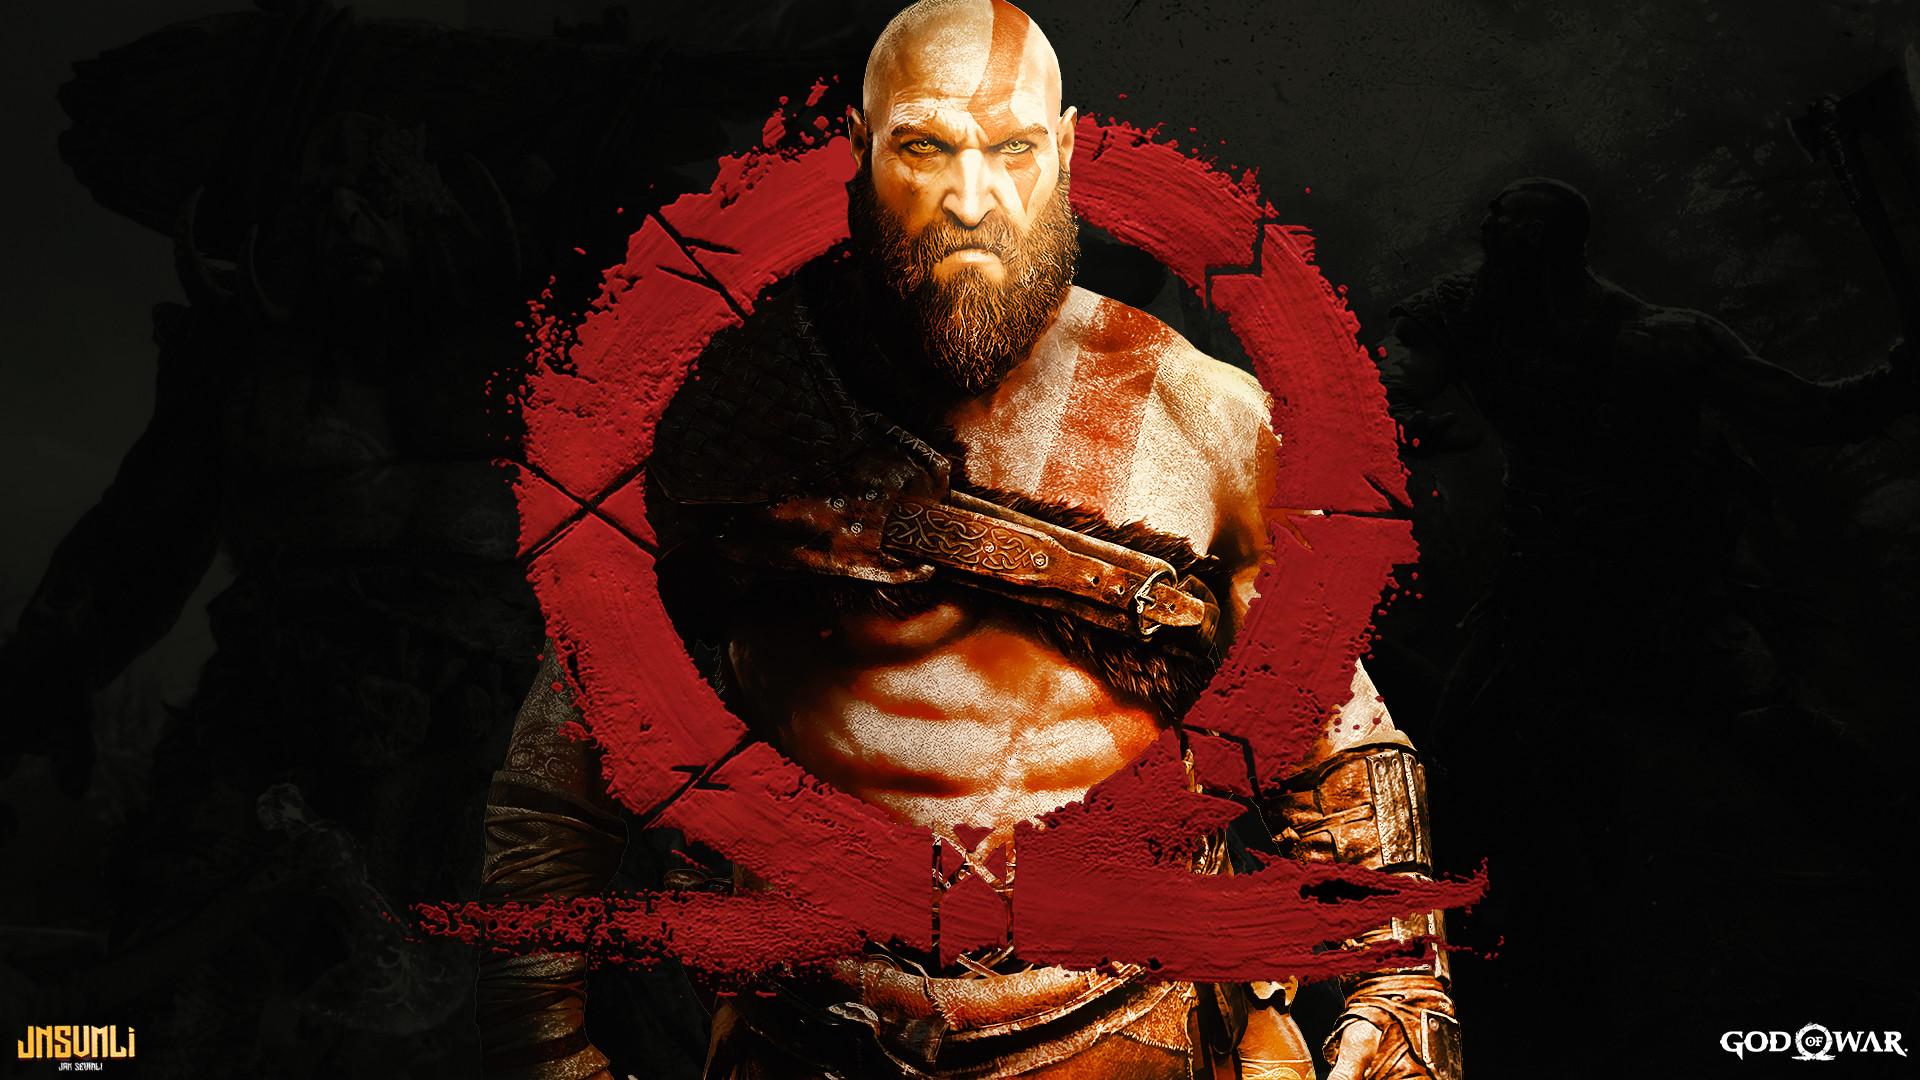 God Of War 4 Wallpaper - God Of War Hd Wallpapers 4k - HD Wallpaper